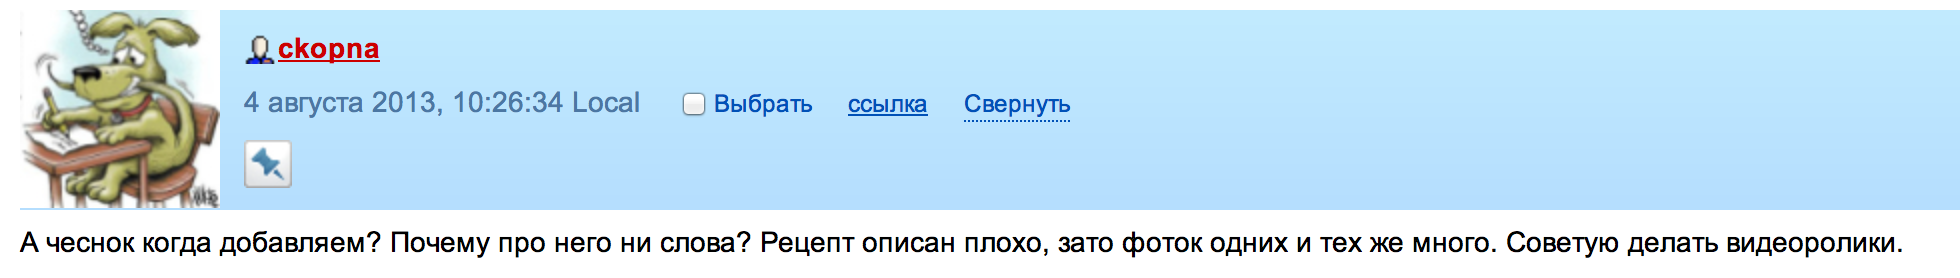 Снимок экрана 2013-08-04 в 12.36.12